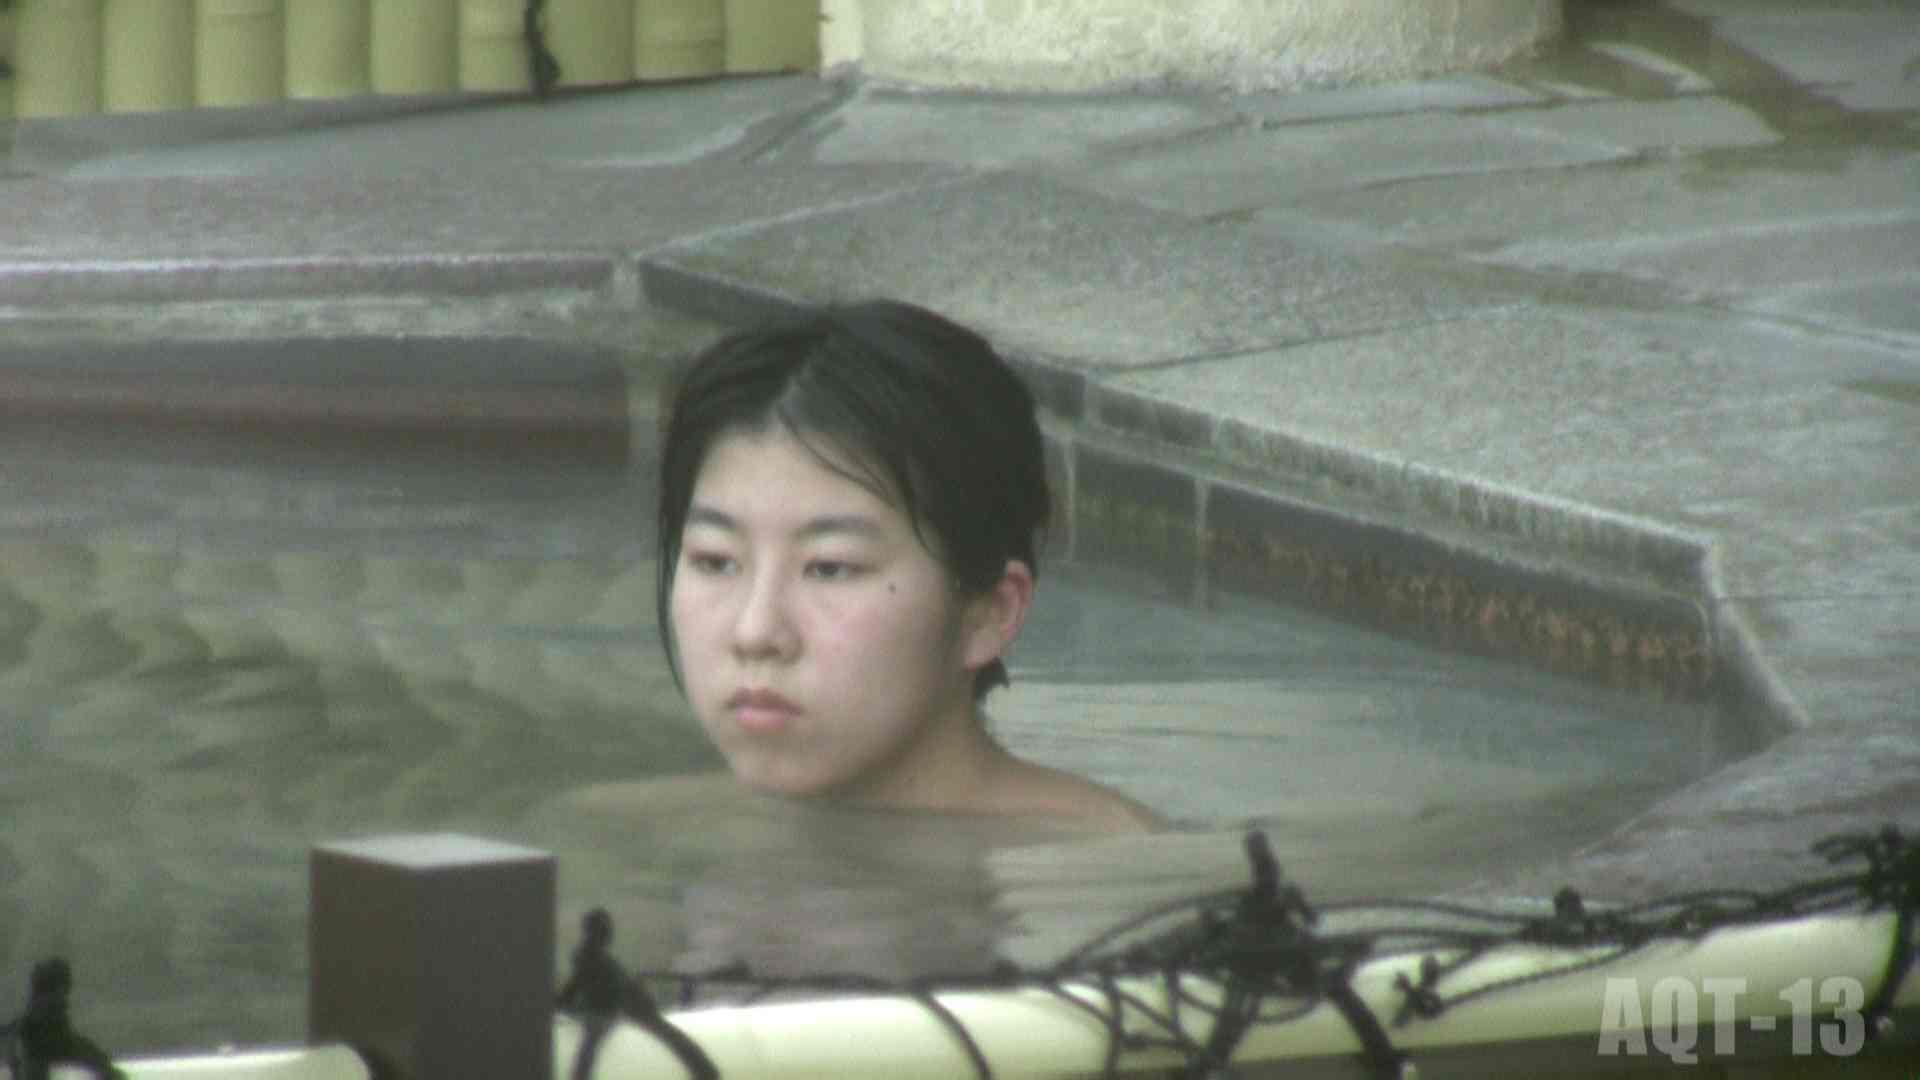 Aquaな露天風呂Vol.816 盗撮 オマンコ無修正動画無料 80画像 35